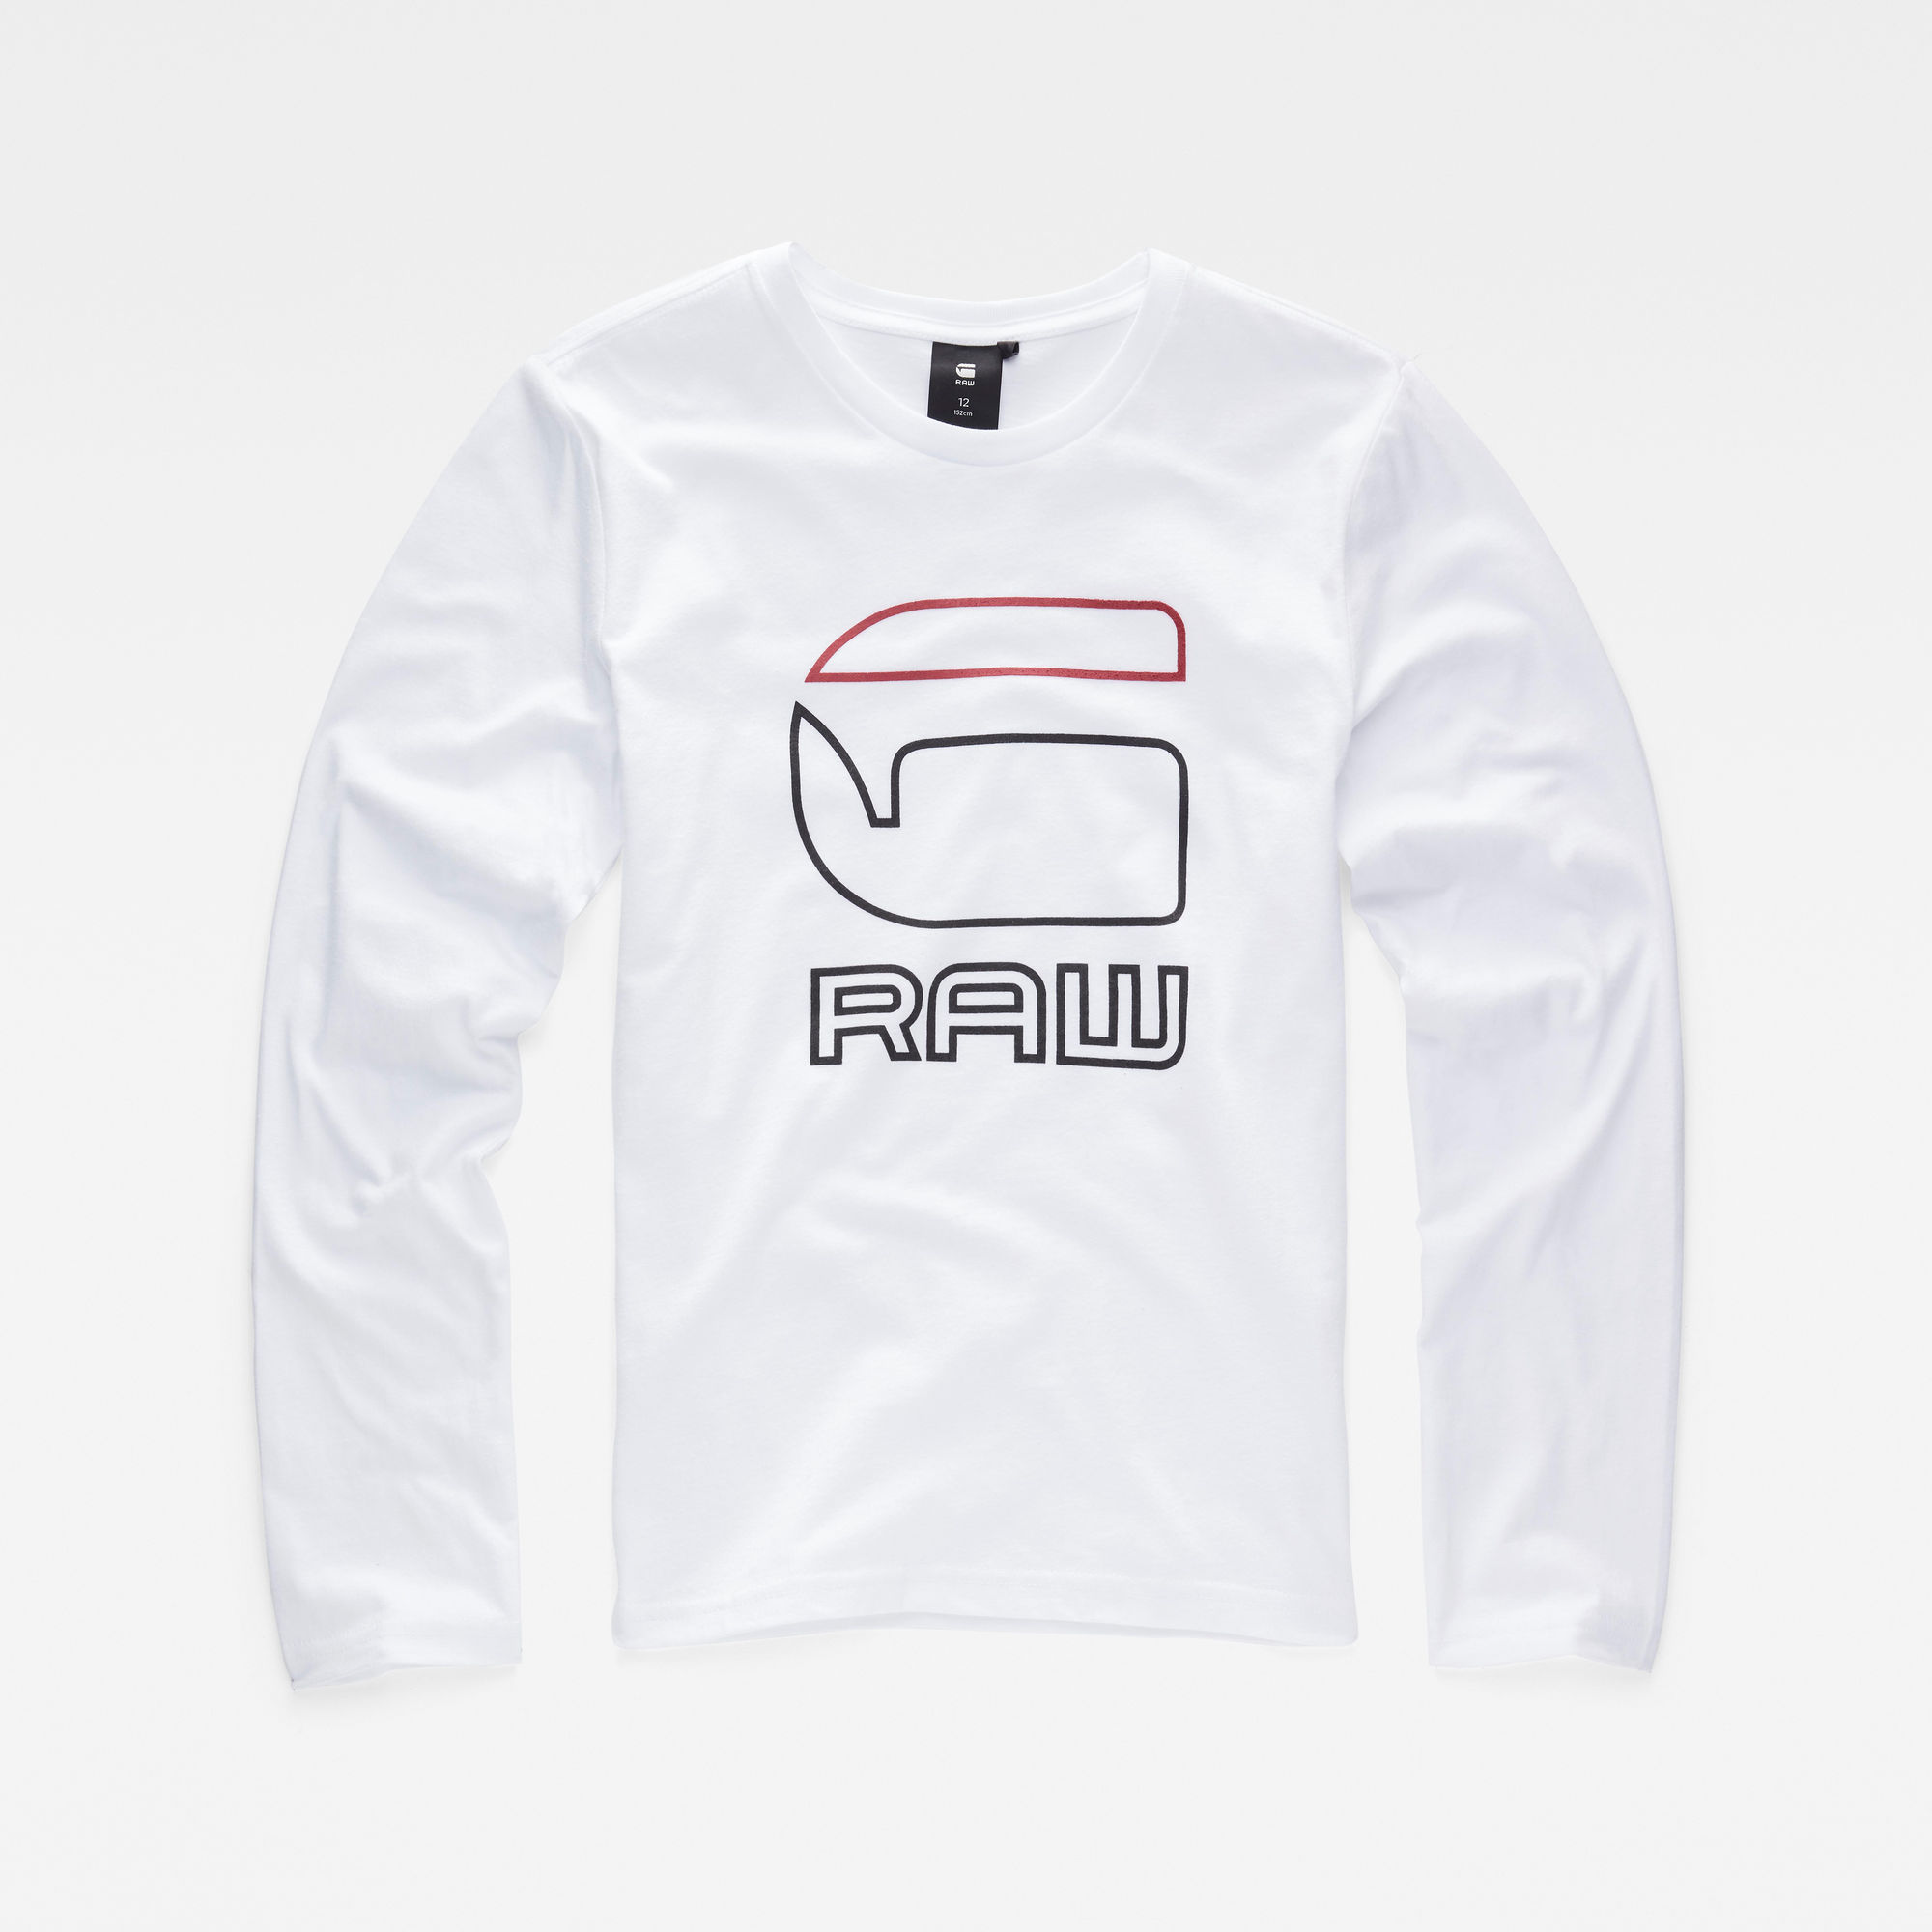 G-Star RAW Jongens T-shirt Wit